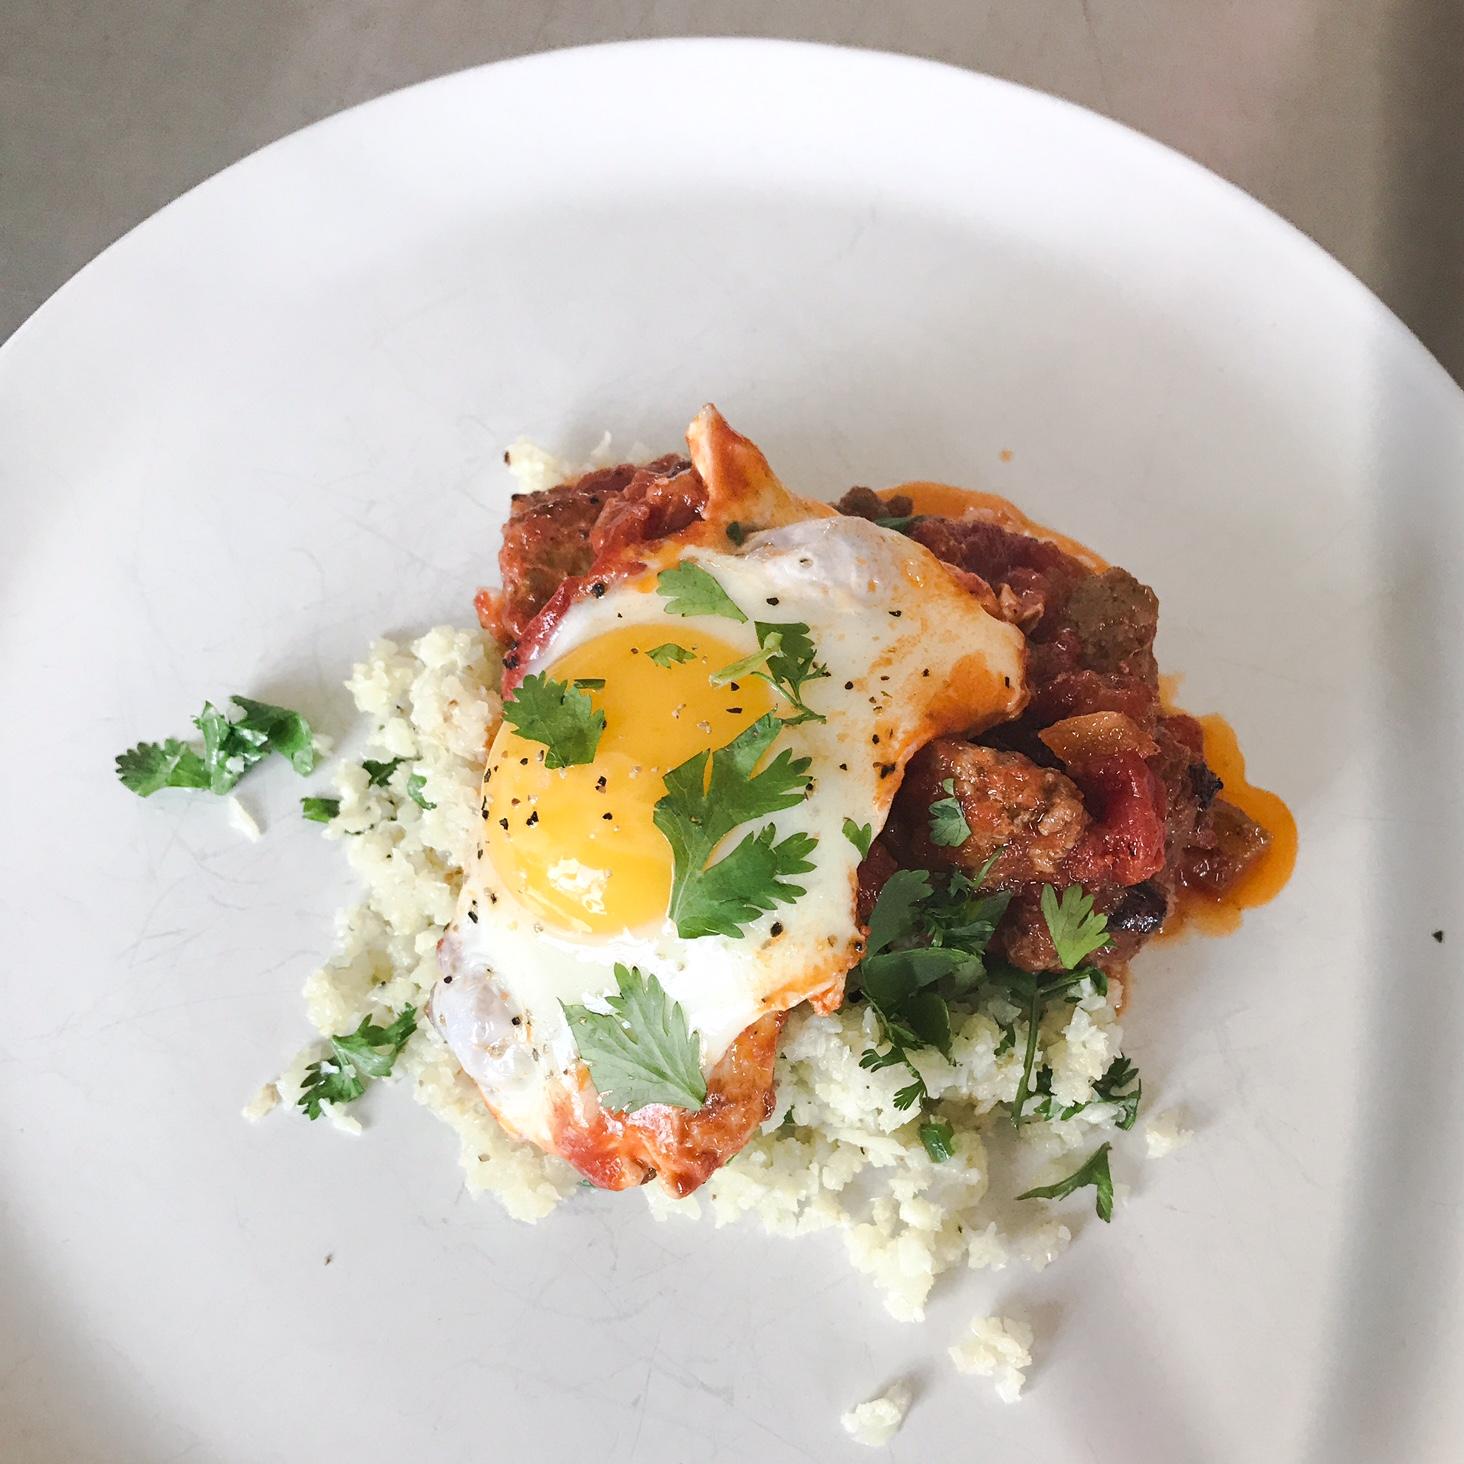 Green Chef's Keto Meal Kit: Lamb Shakshuka